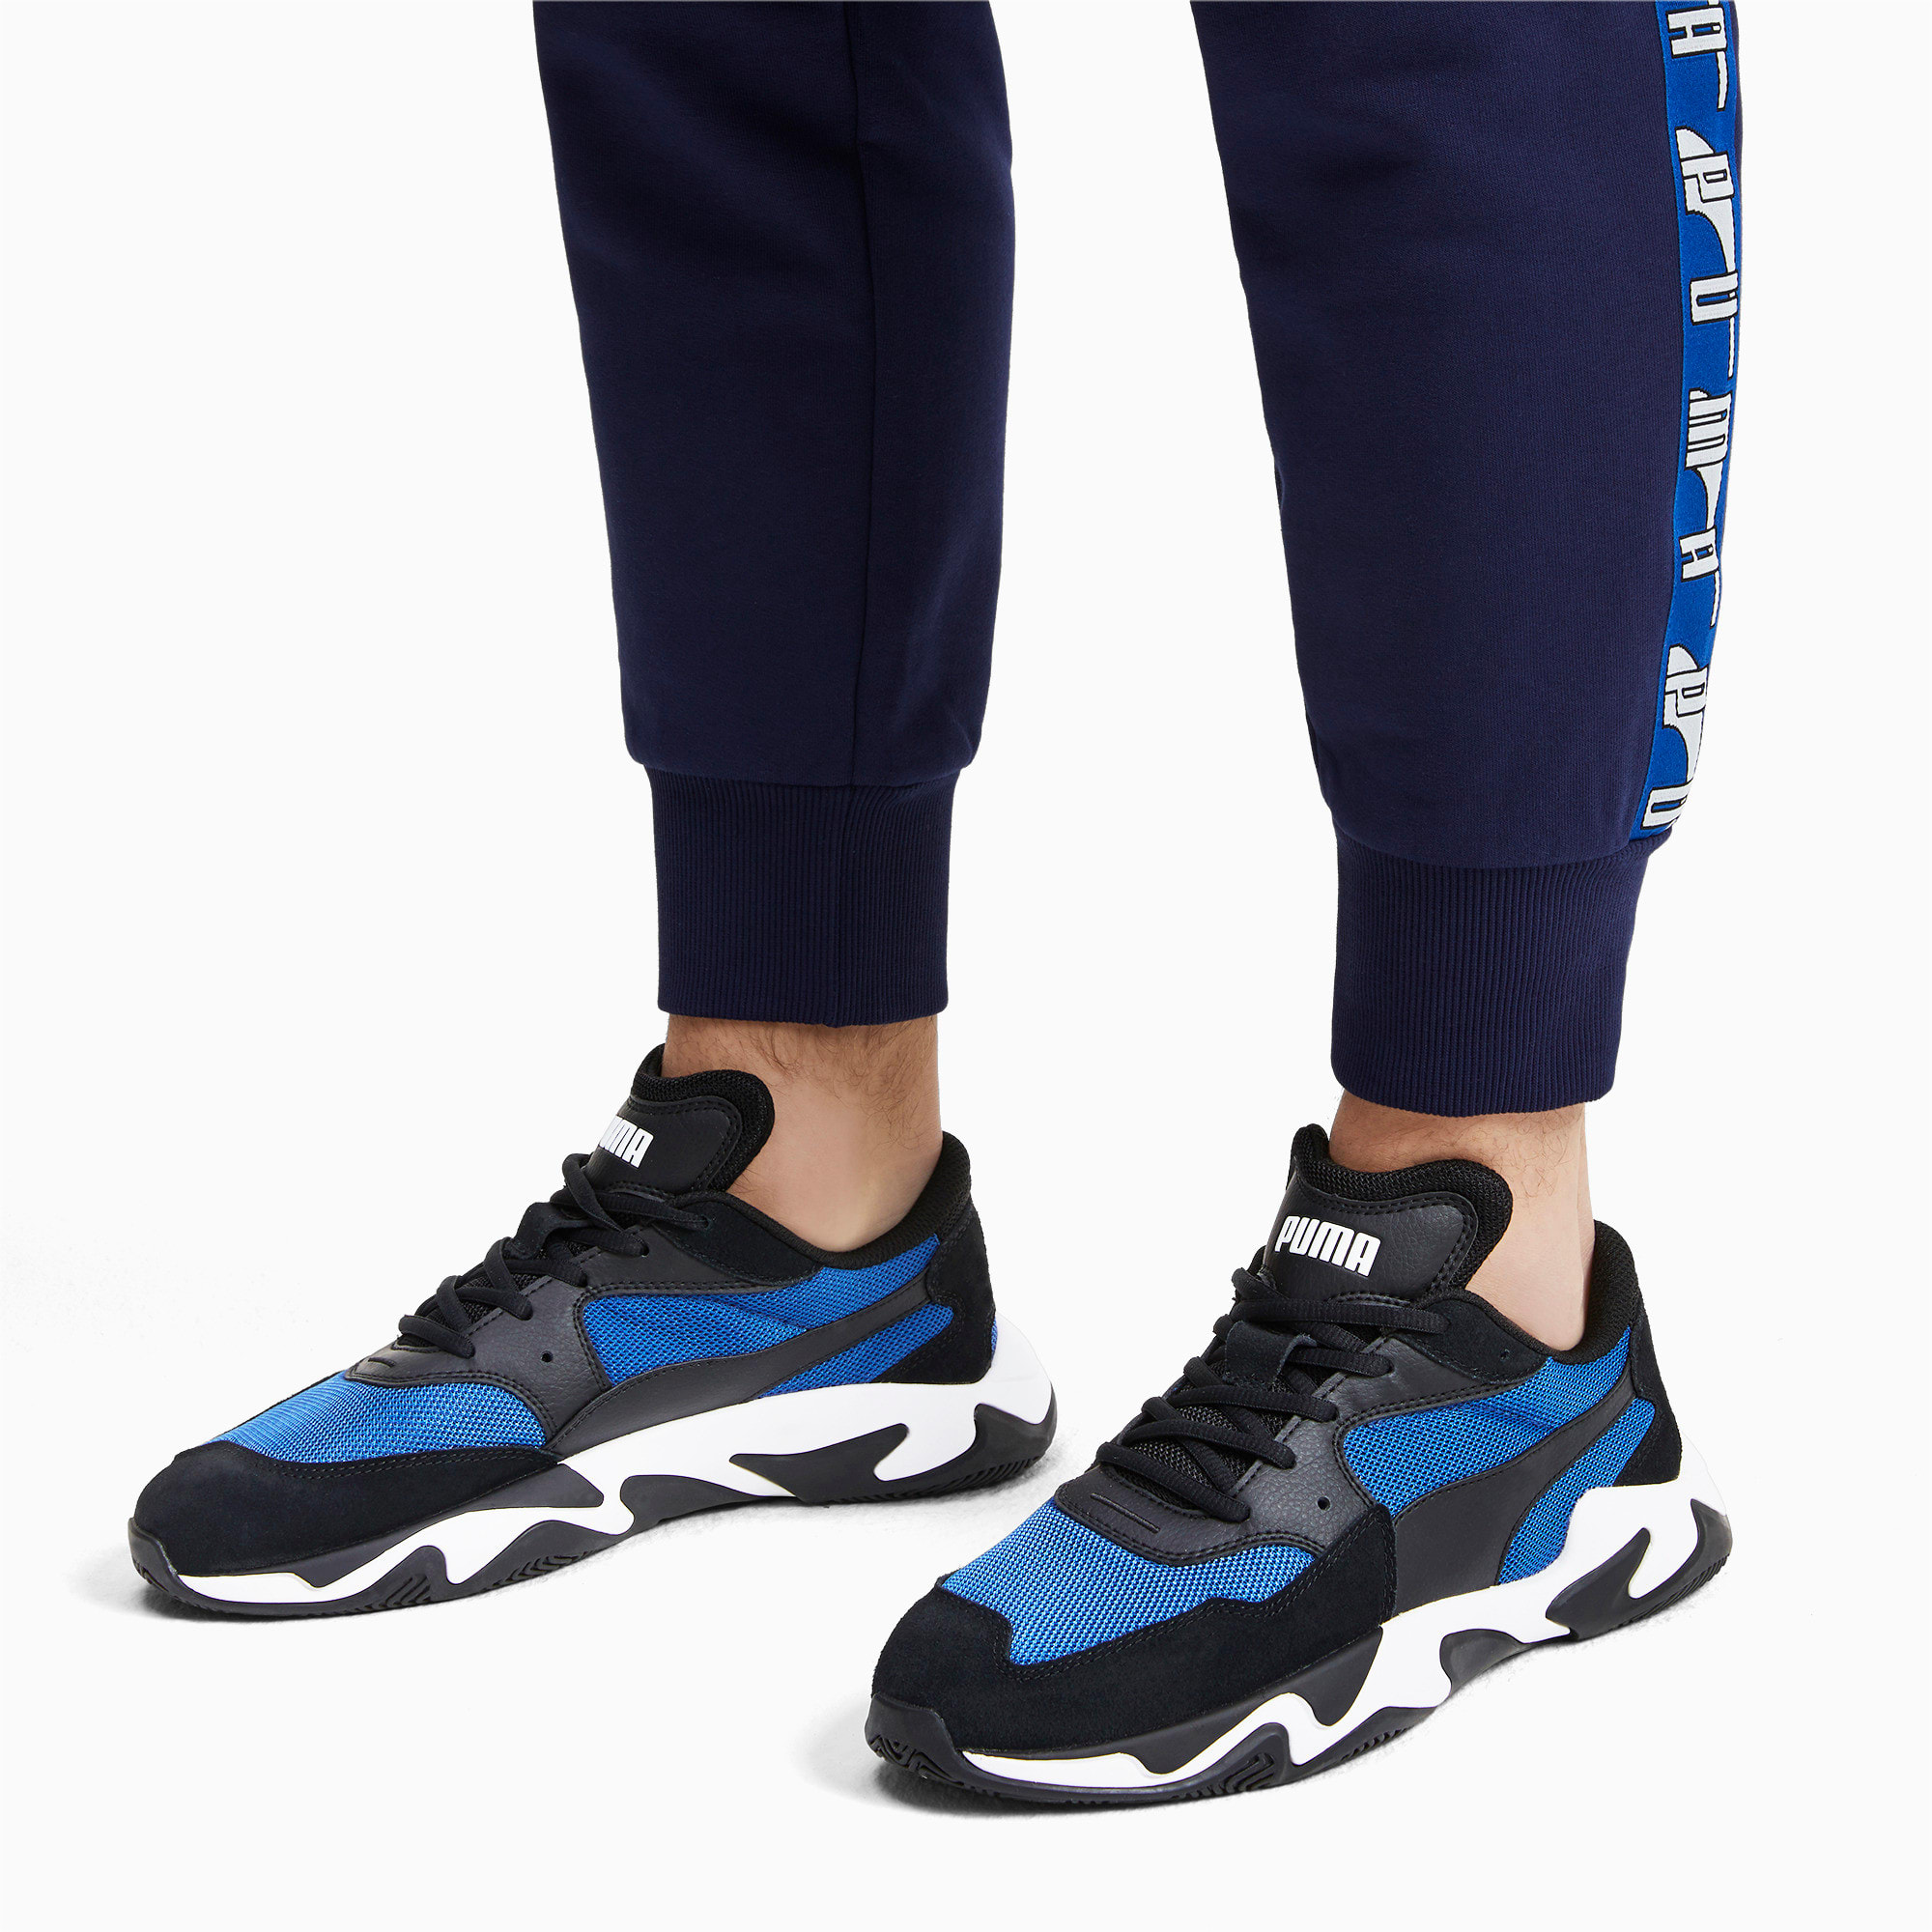 Thumbnail 2 of Storm Adrenaline Sneakers, Puma Black-Galaxy Blue, medium